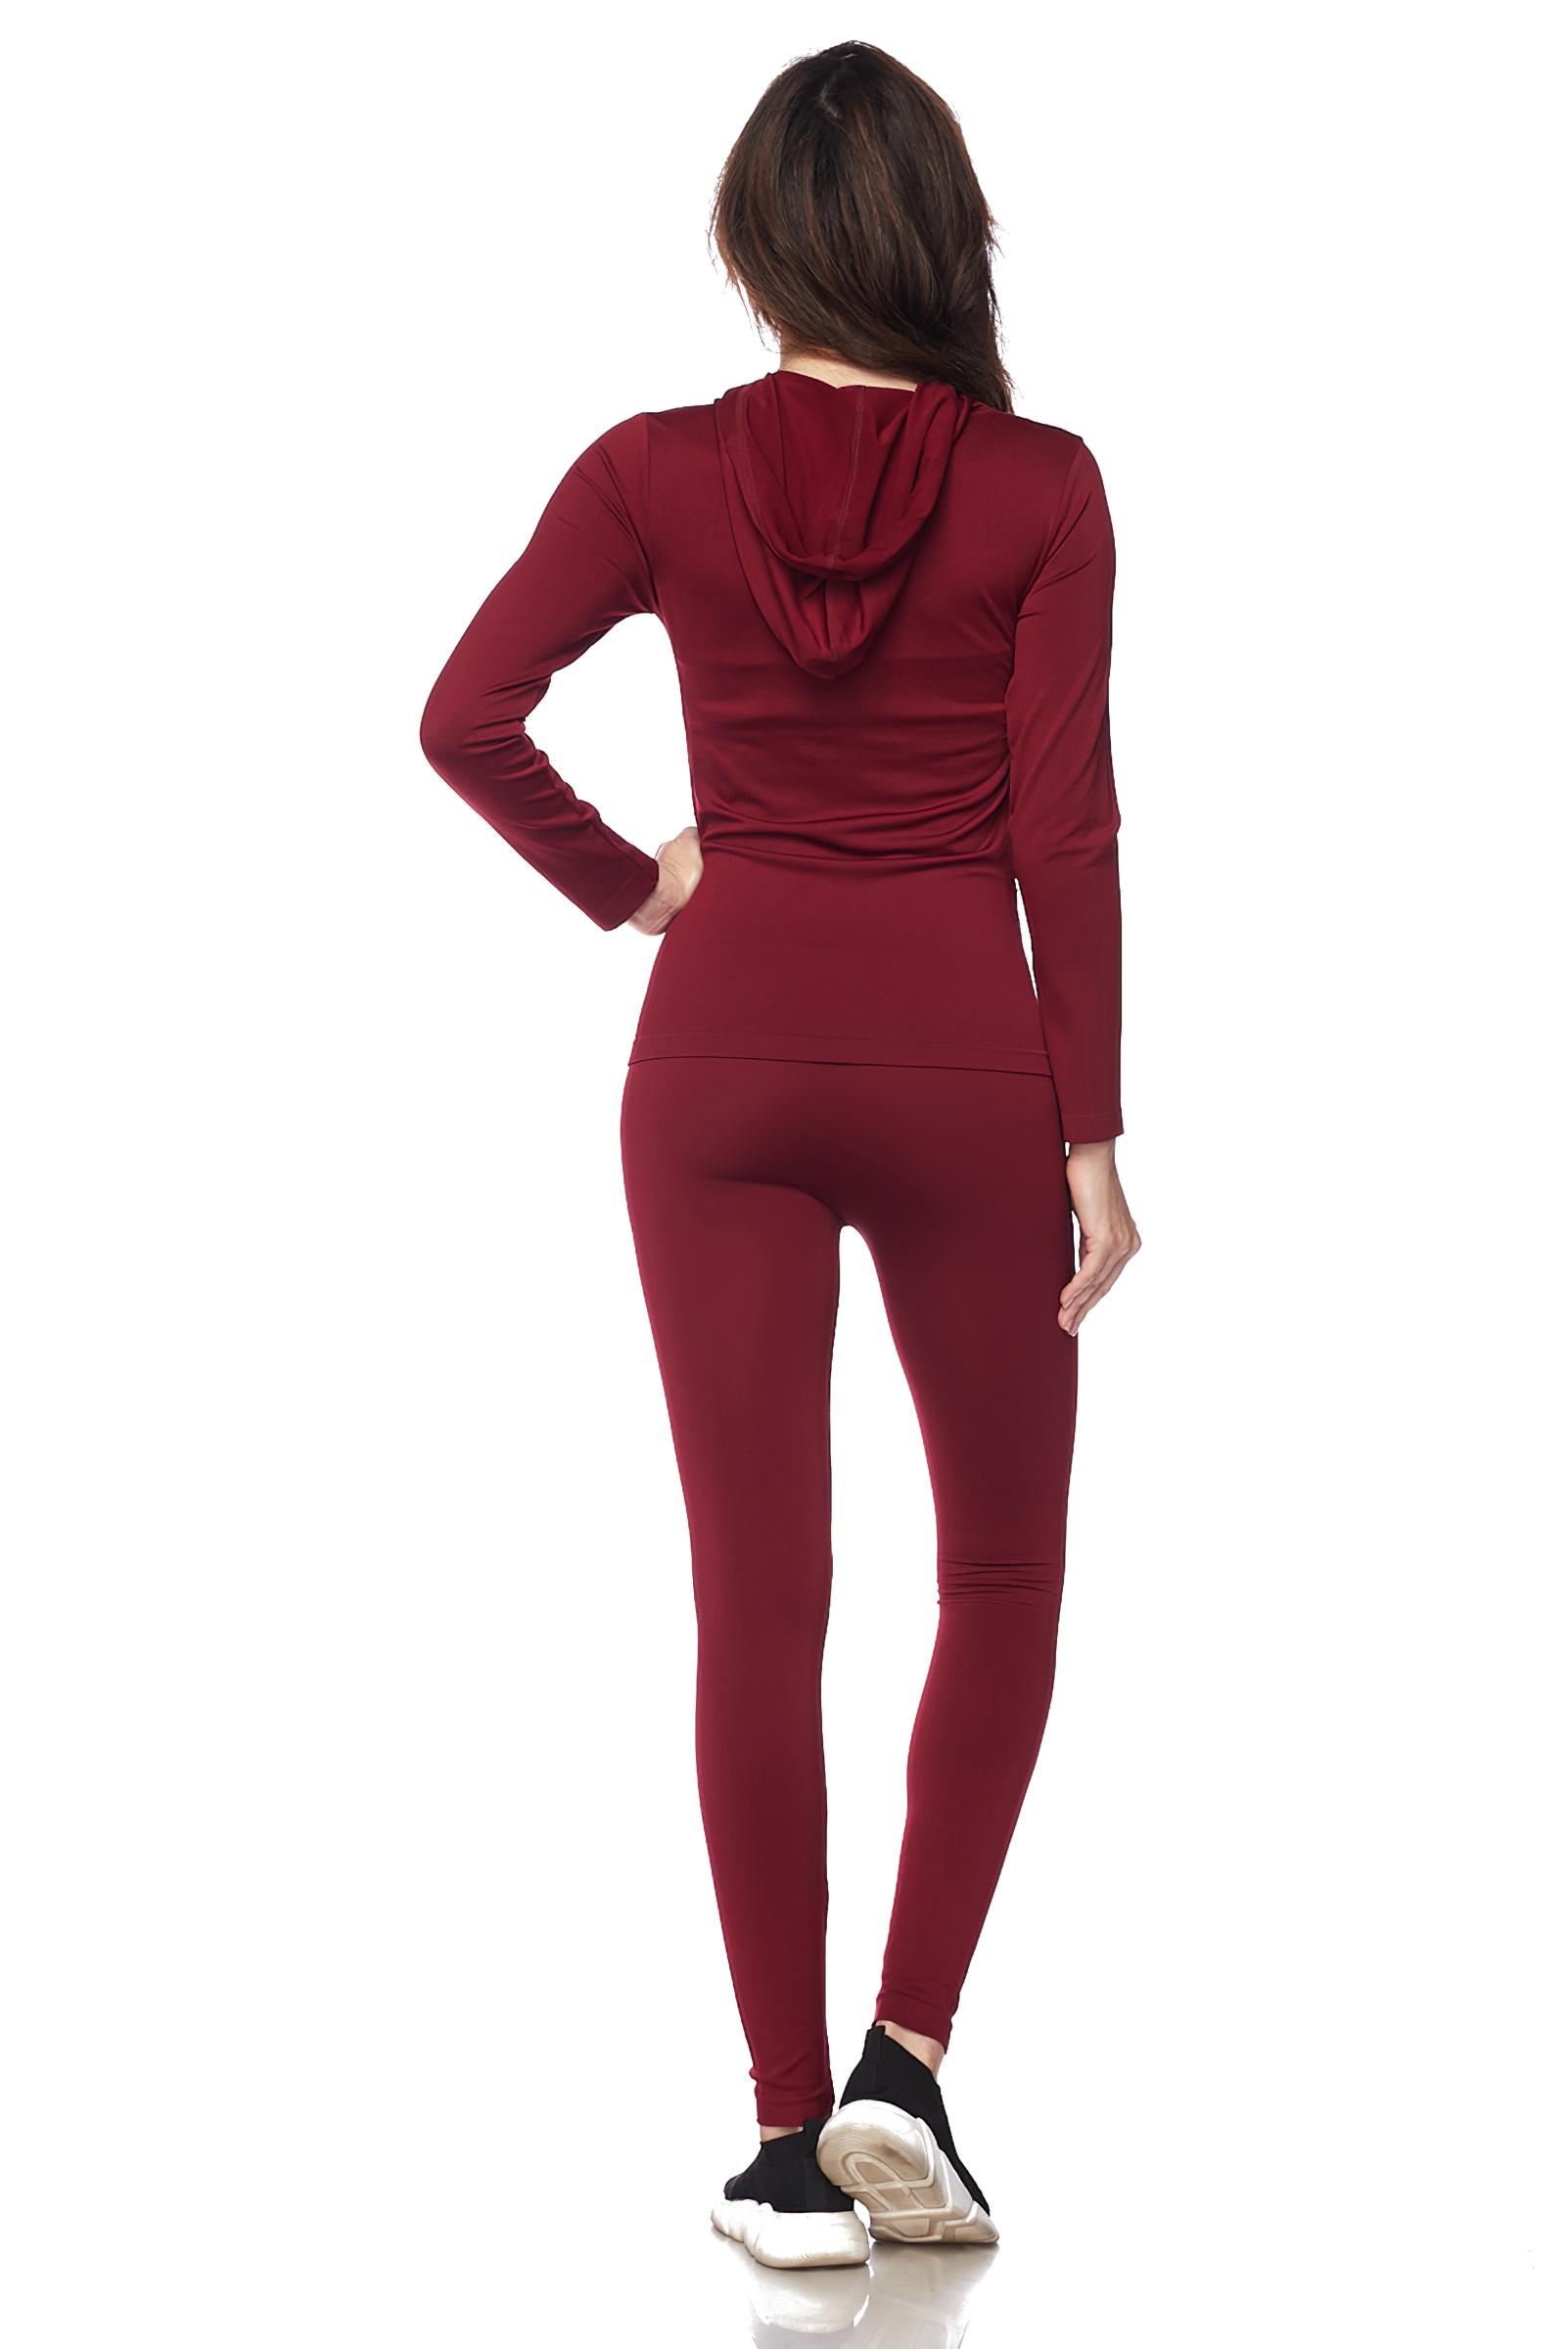 Women-039-s-Juniors-Active-Set-Wear-Zip-Up-Hoodie-and-Legging thumbnail 18